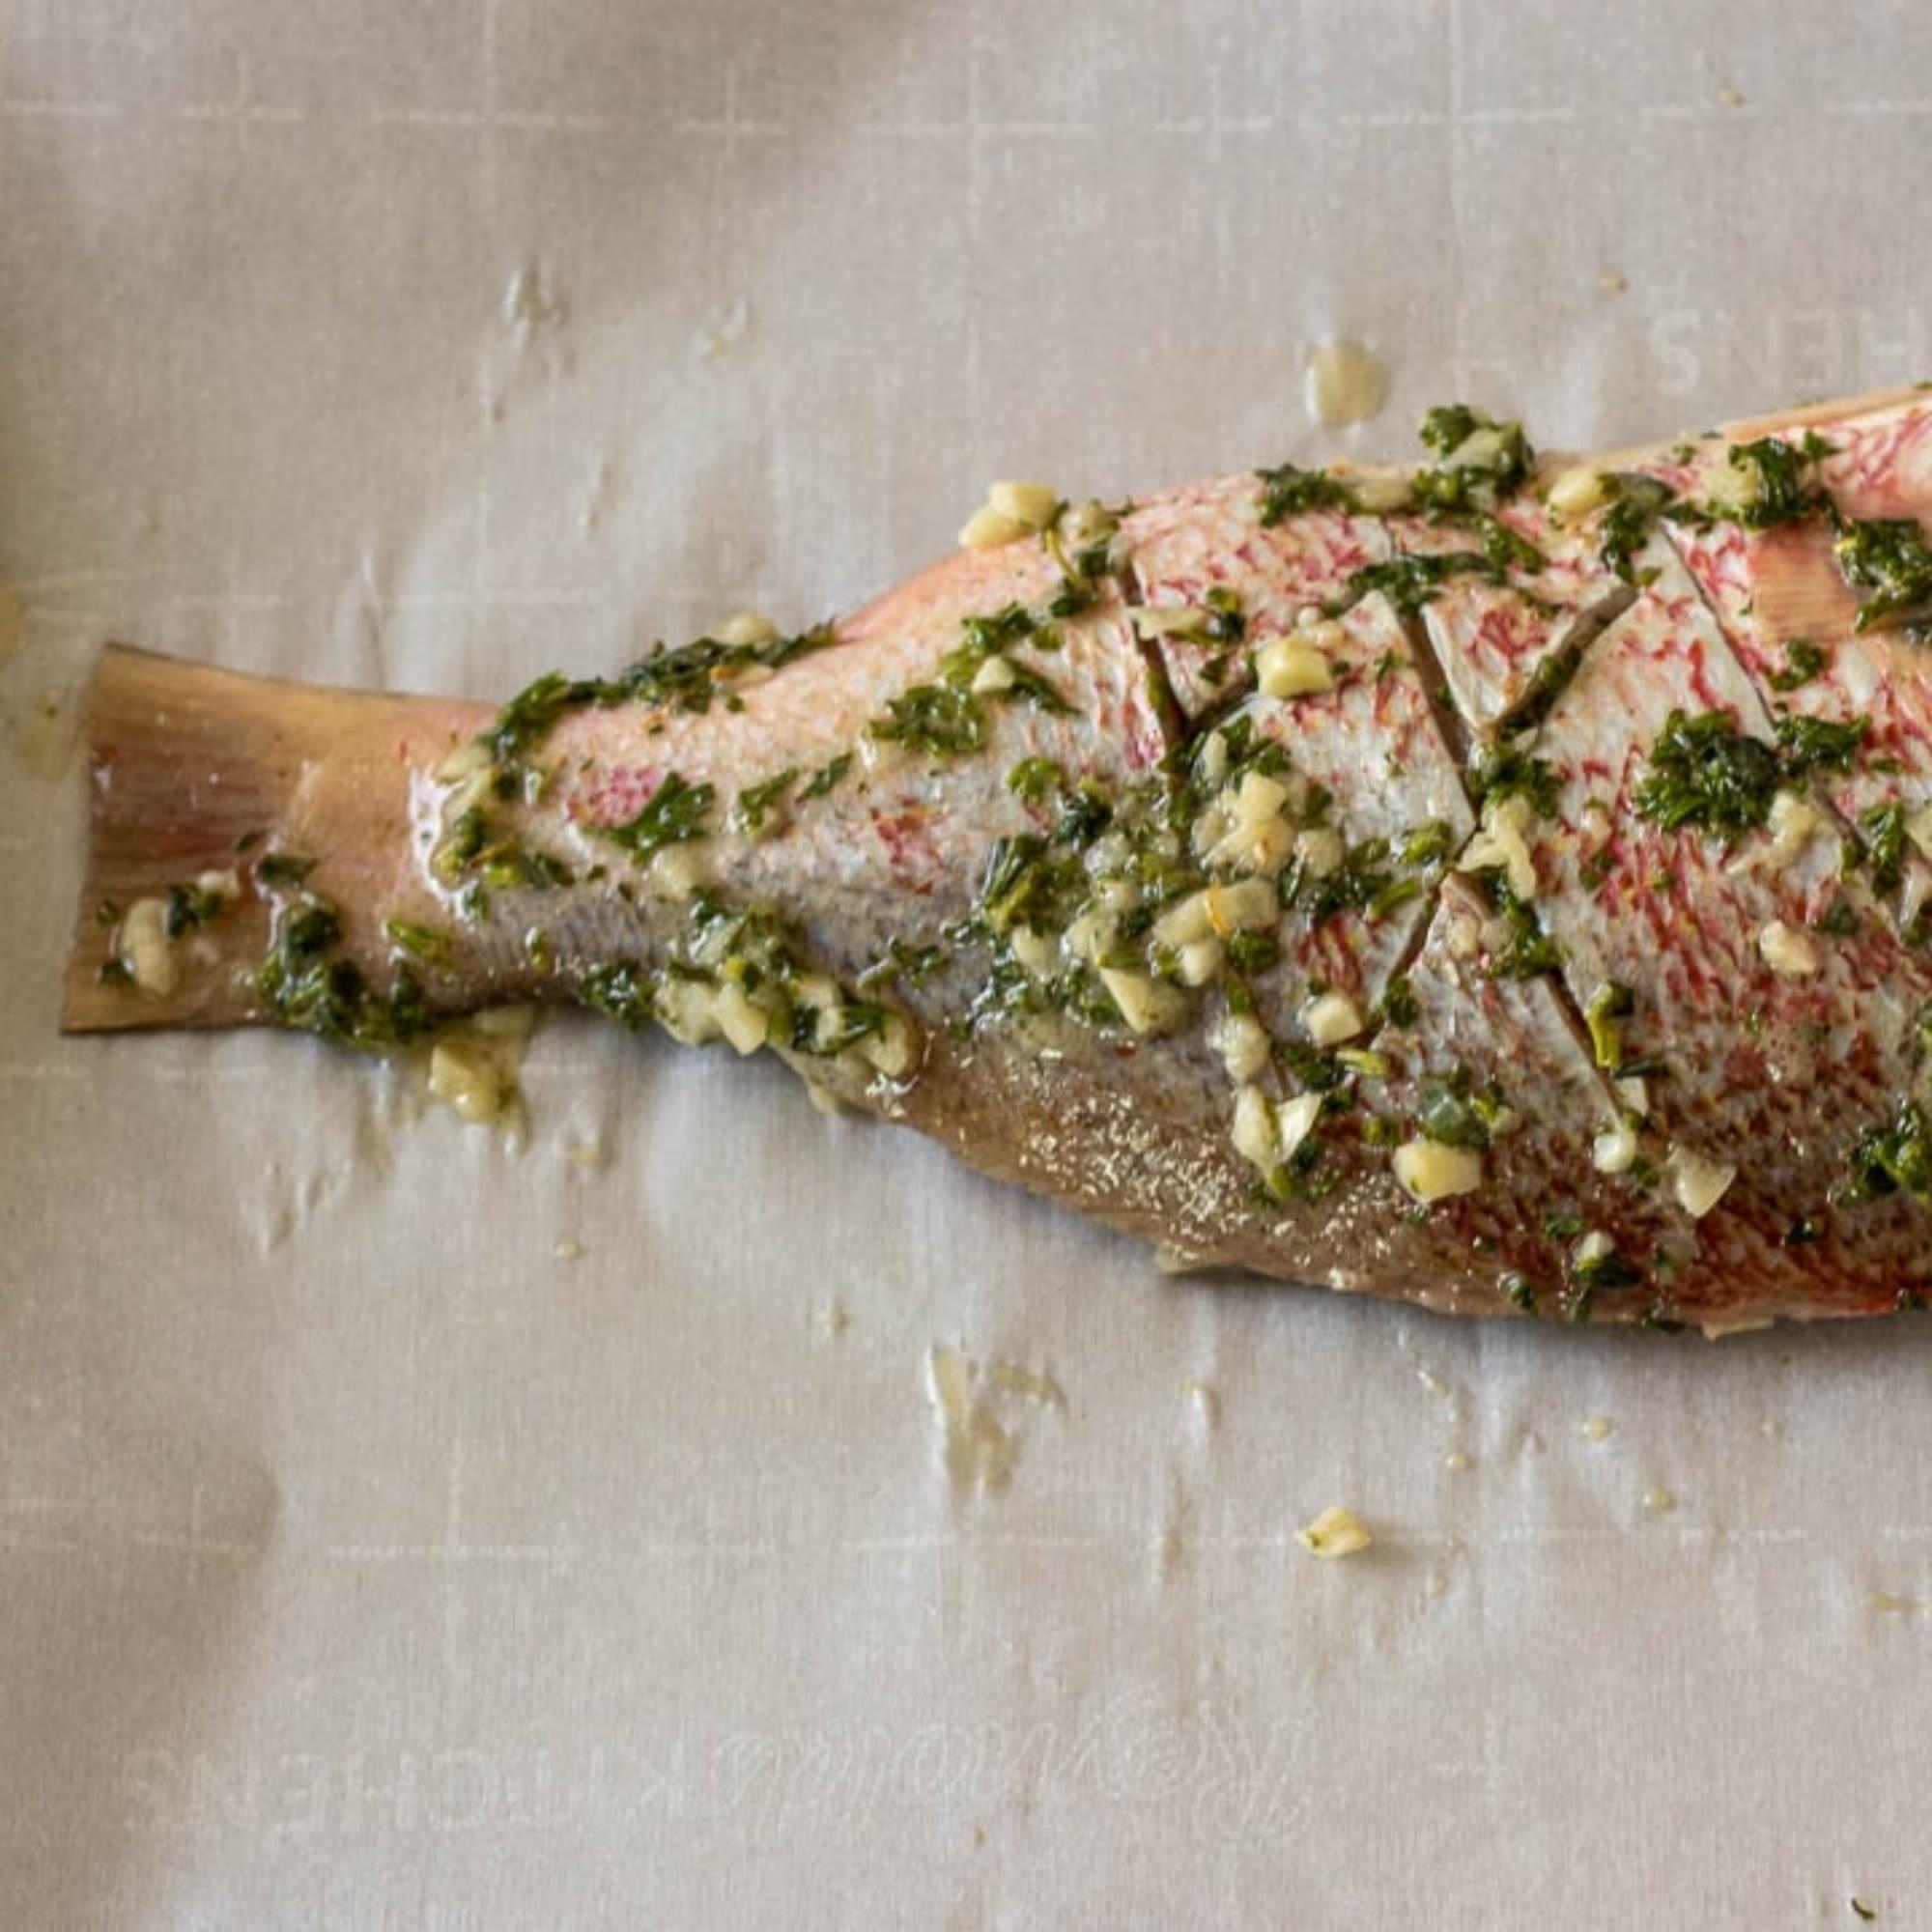 Season the Fish